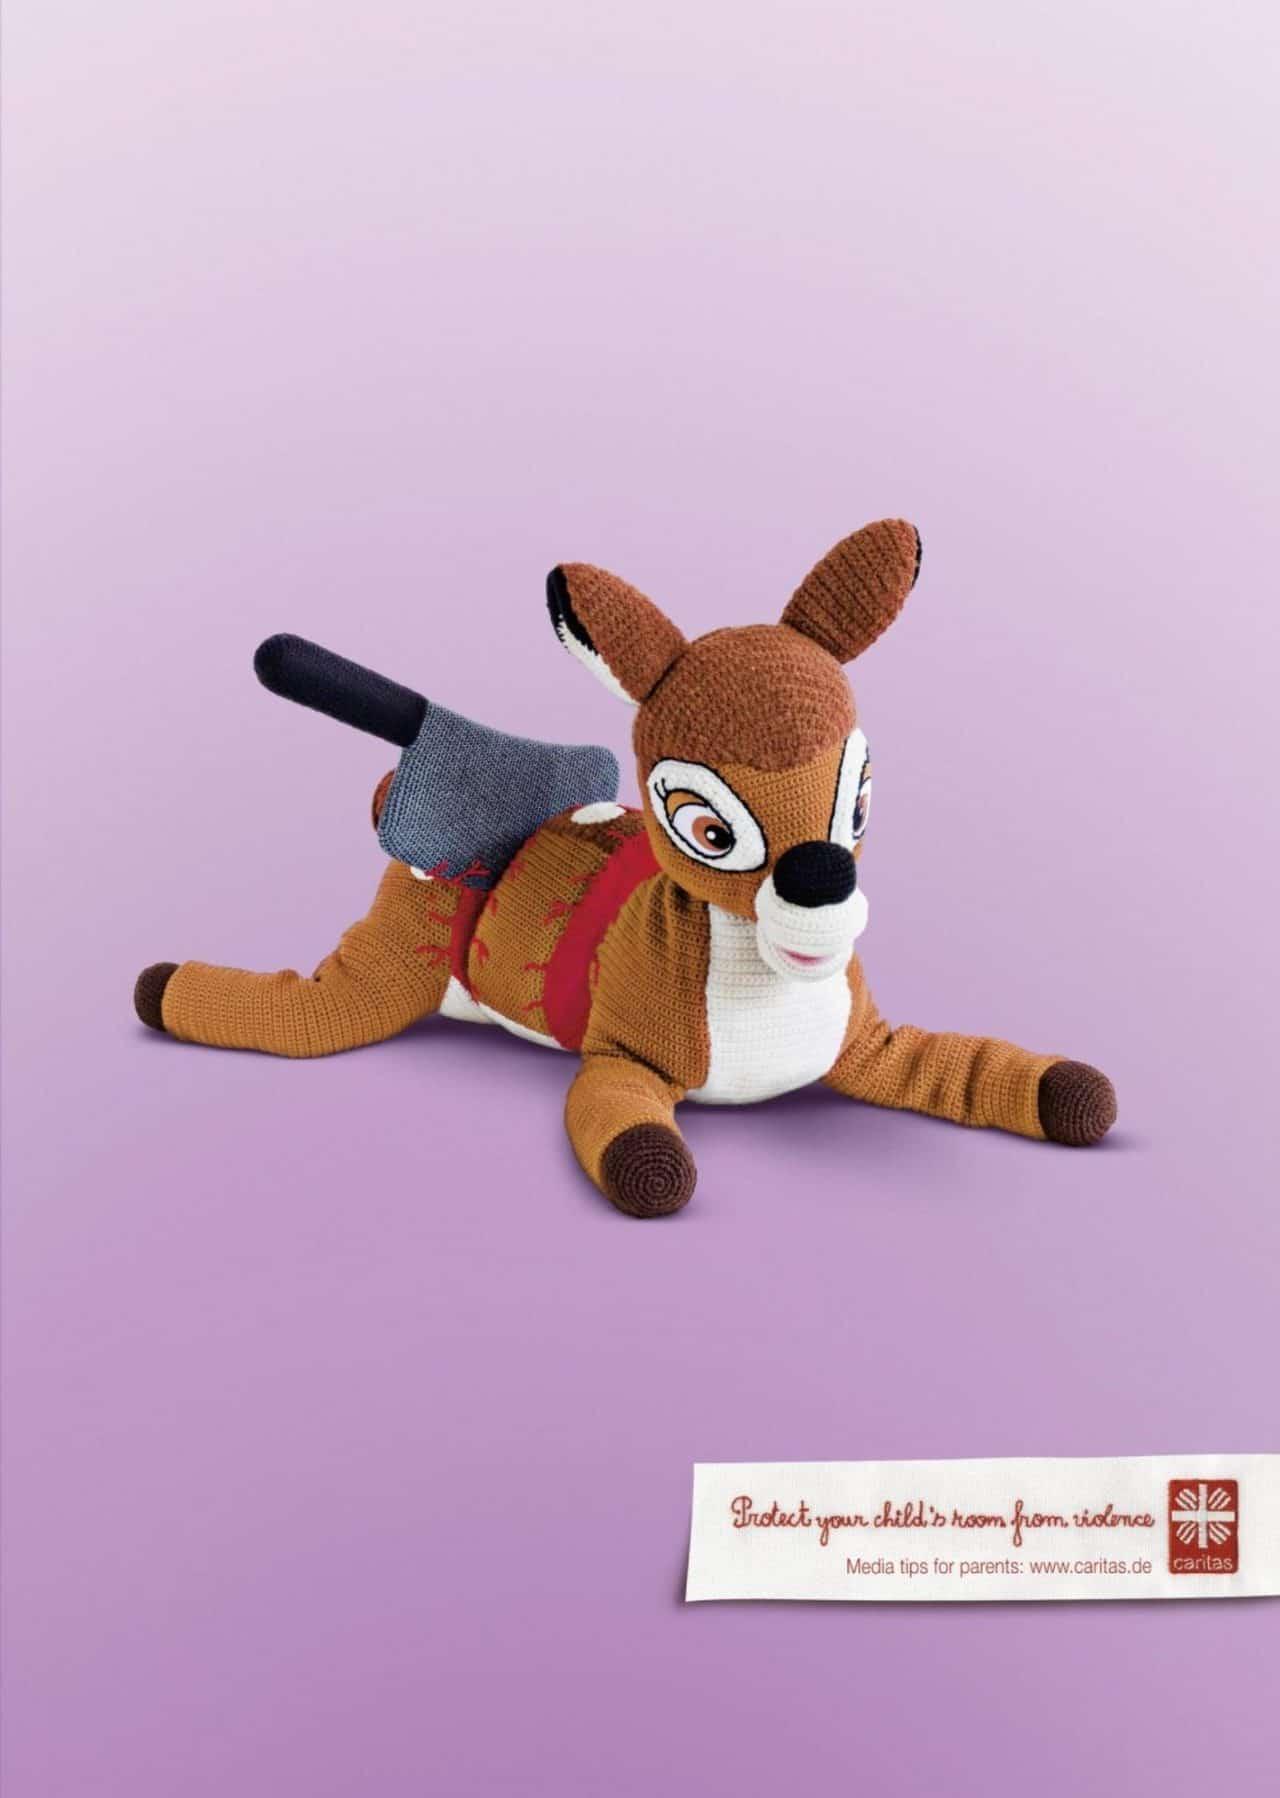 caritas jouets violence 3